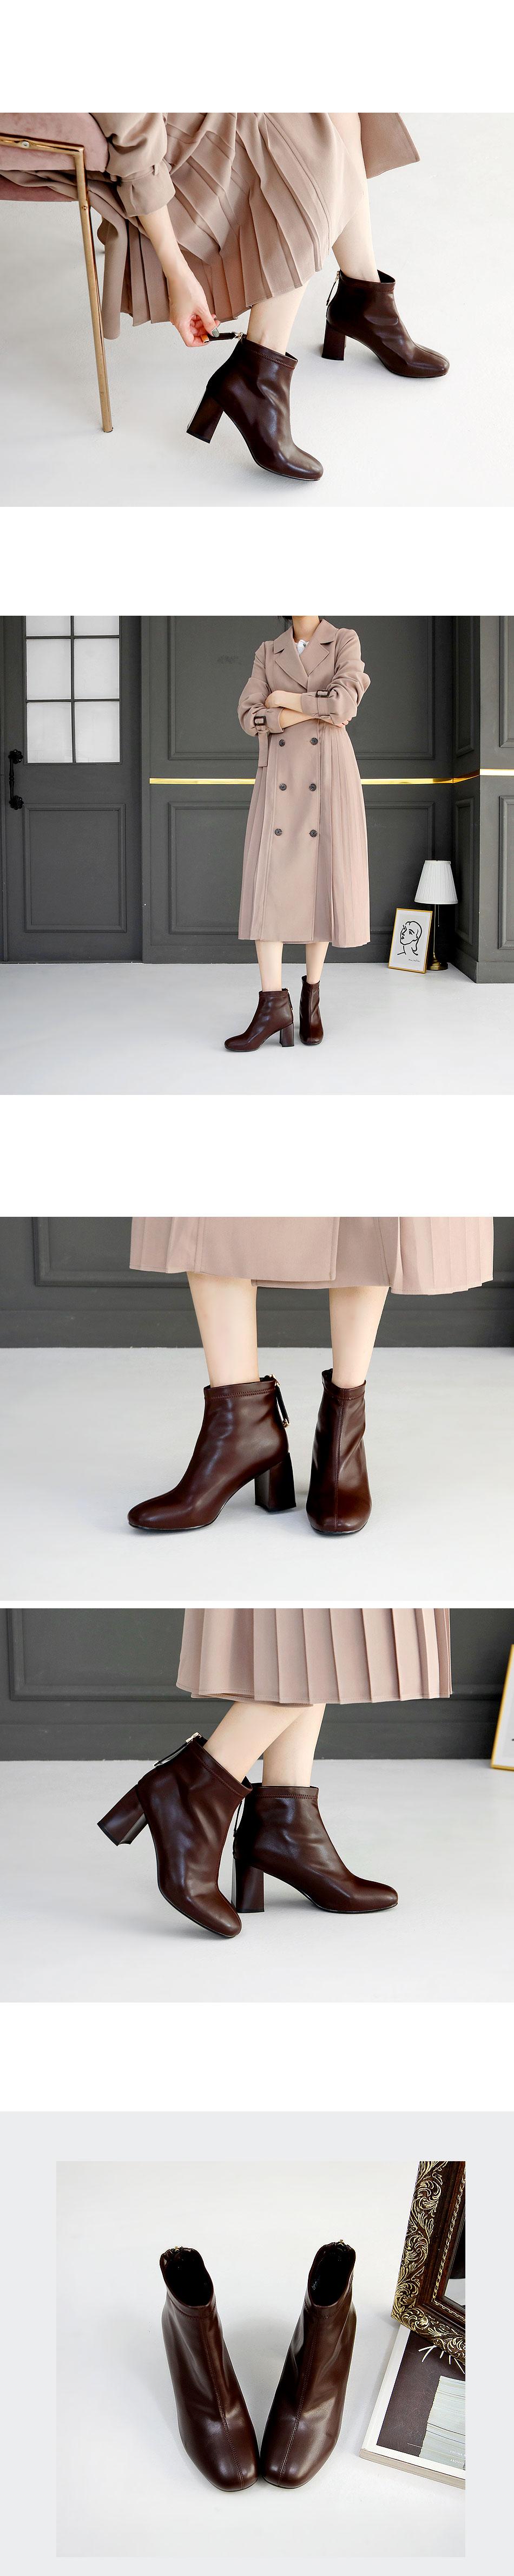 Morise Ankle Boots 7cm